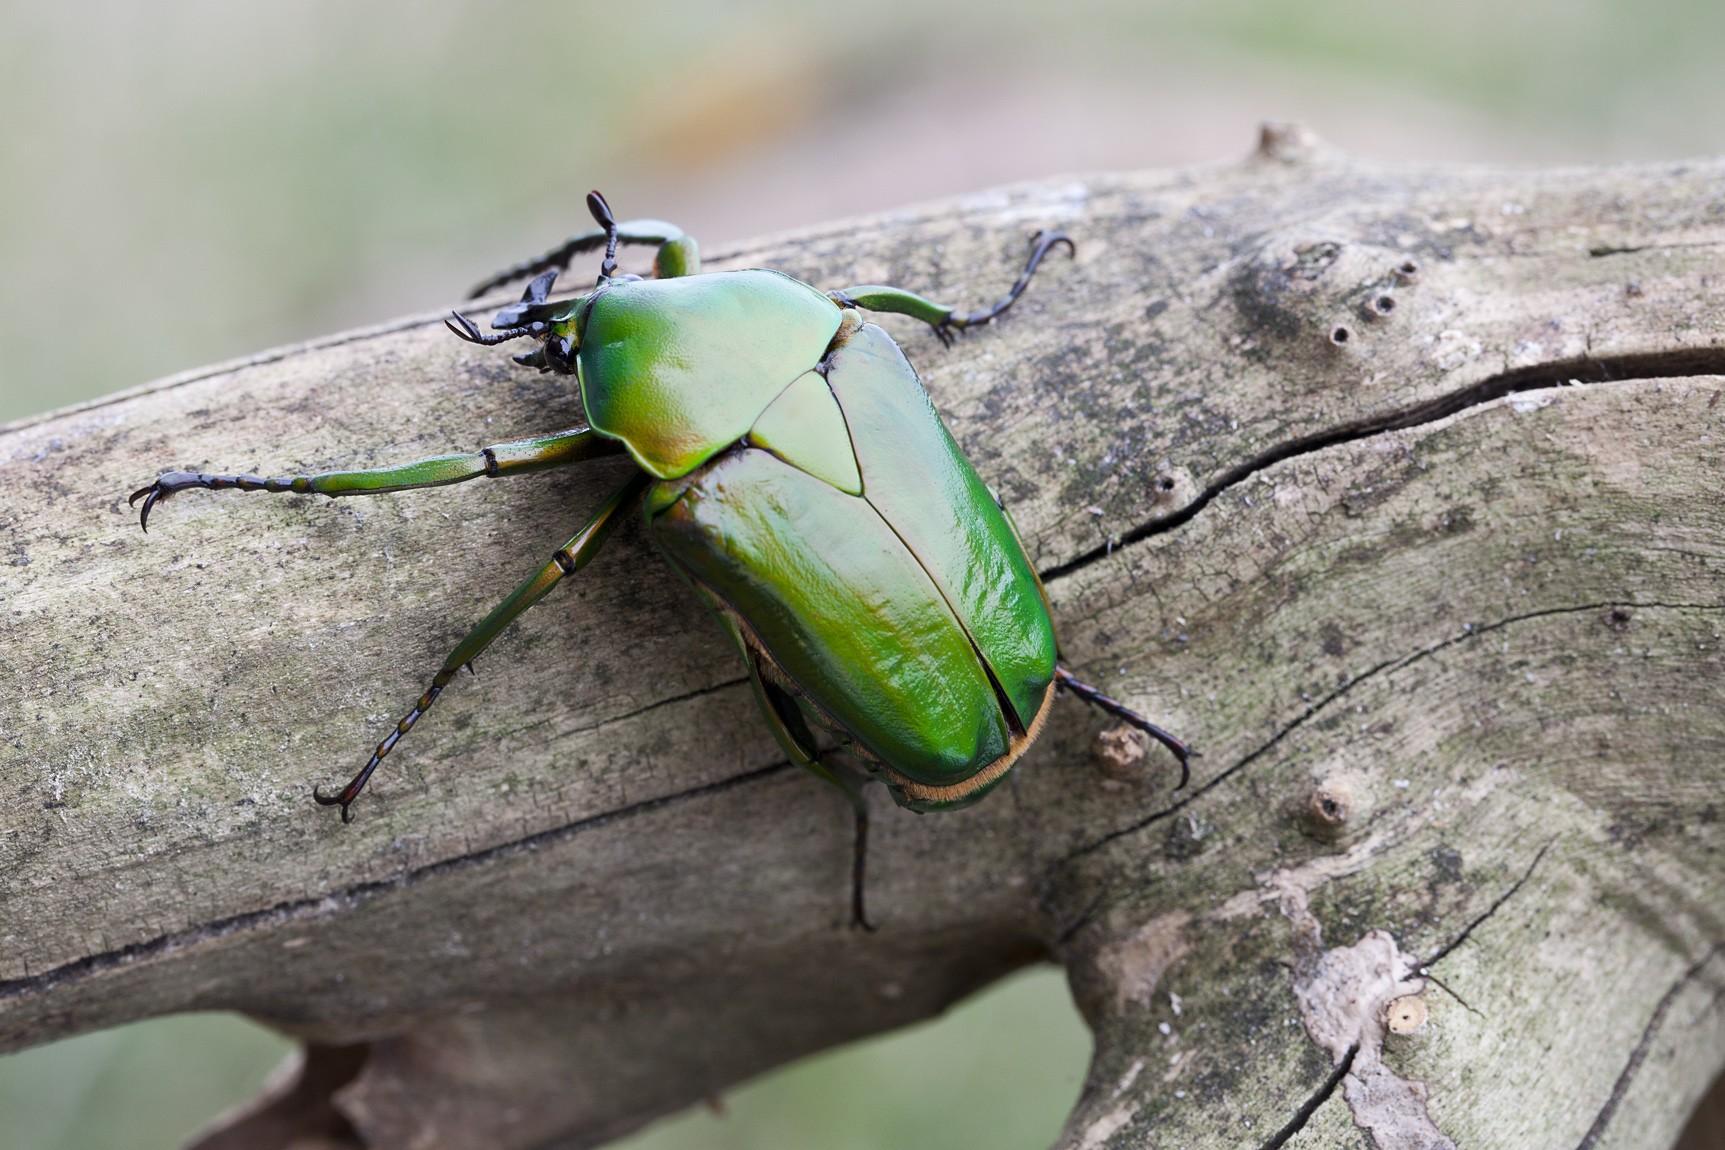 «Личинка майского жука» фото - dicronorrhina micans